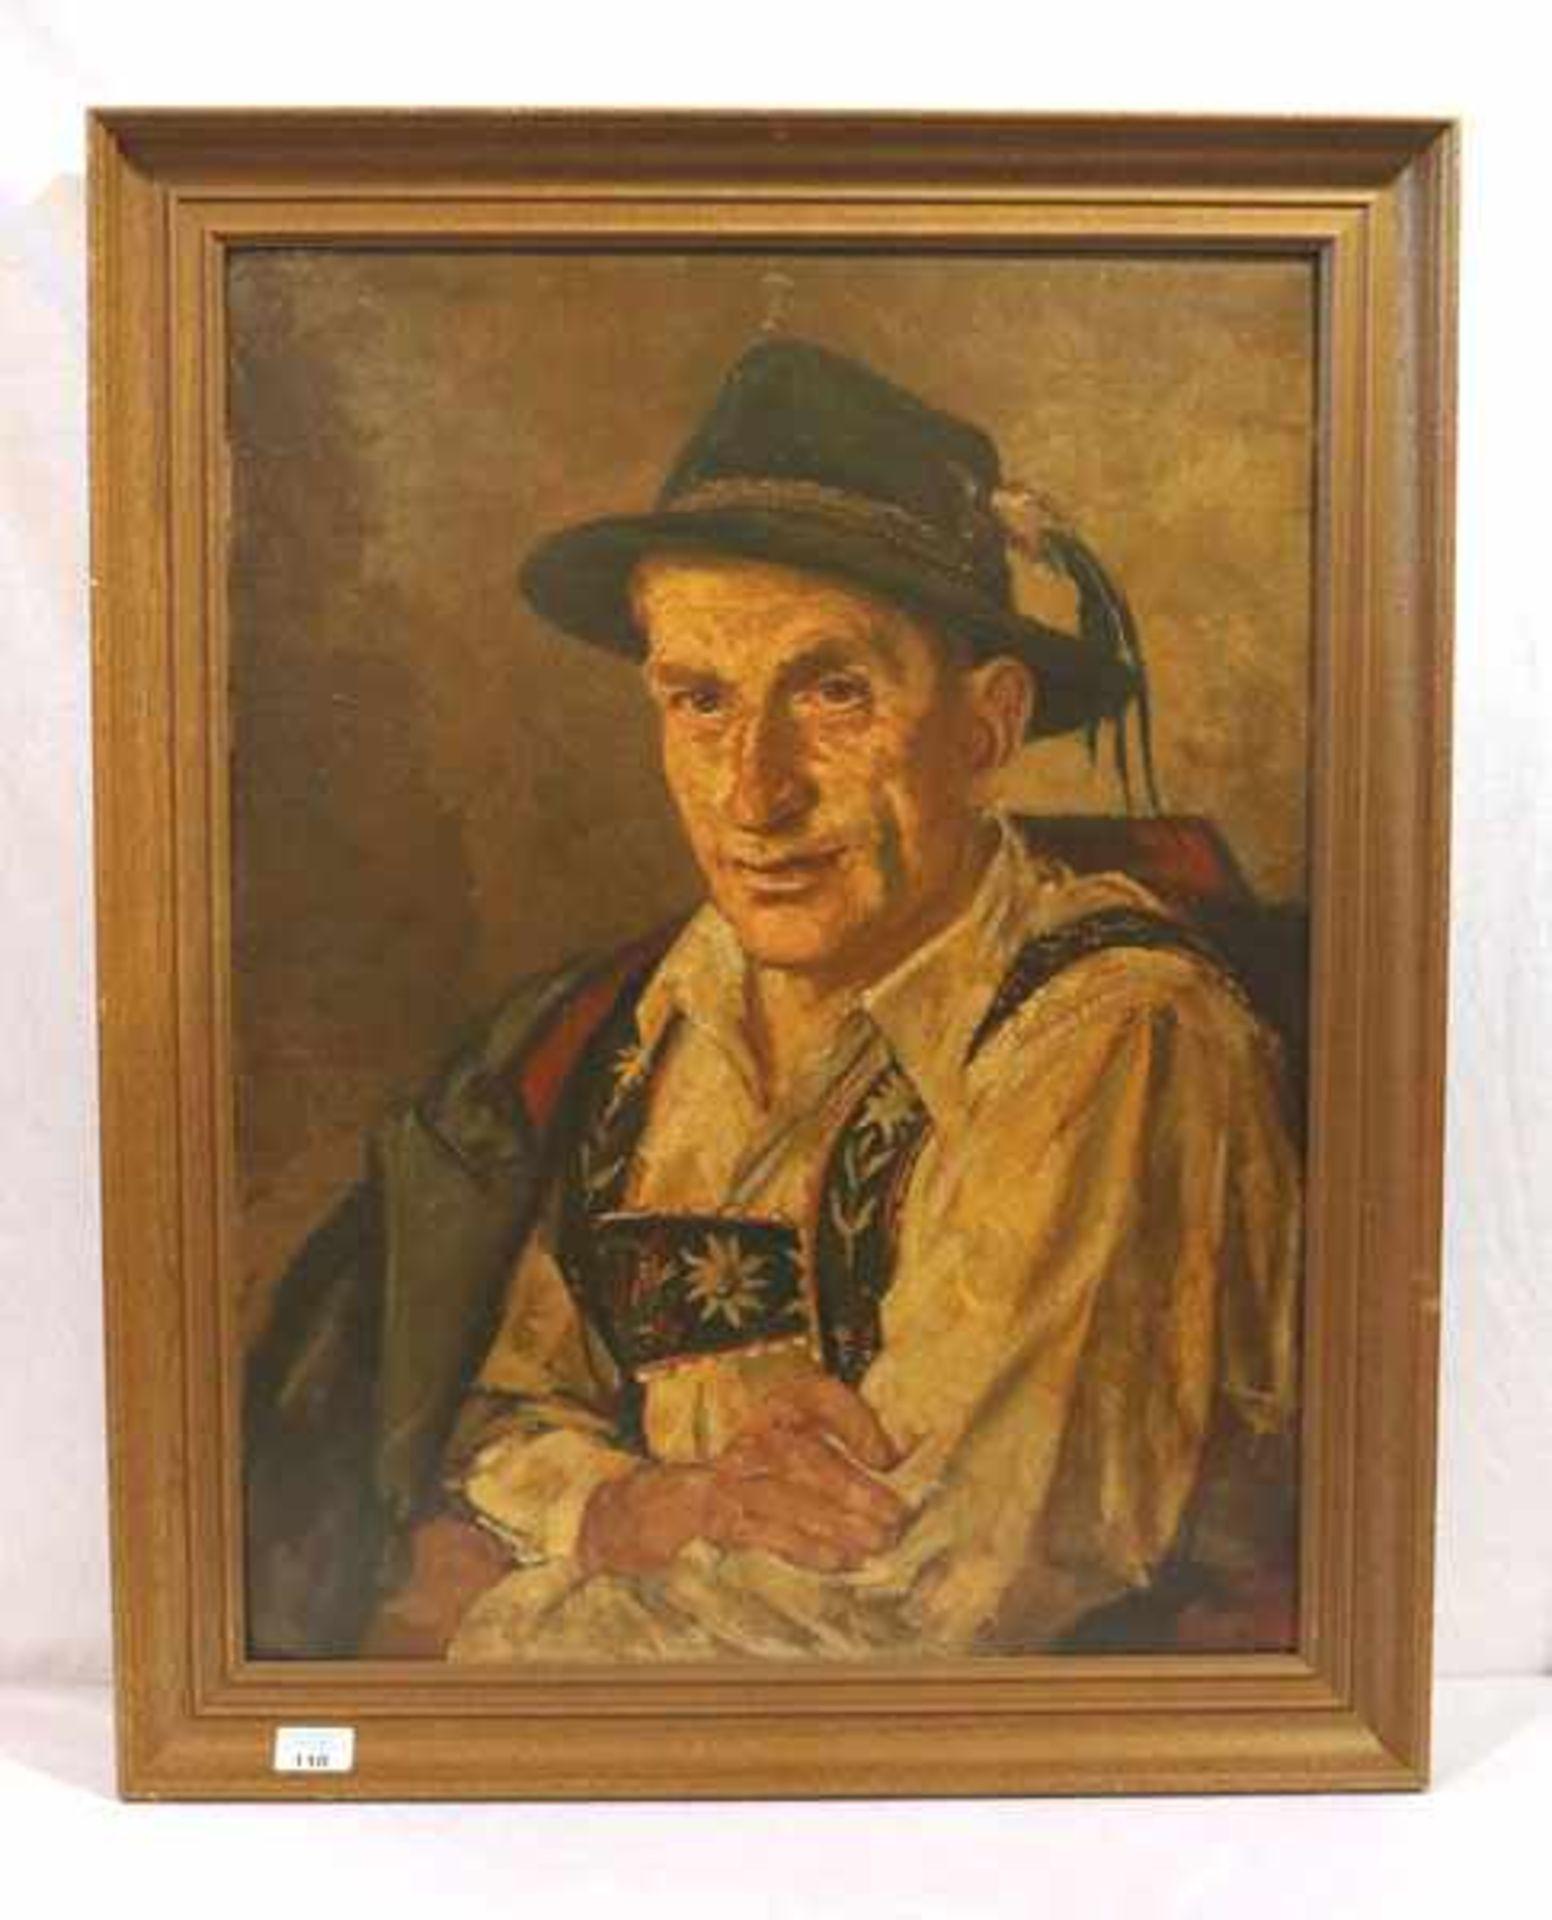 Los 110 - Gemälde ÖL/Malkarton 'Herrenbildnis mit Tracht', signiert G. (Gisbert) Palmie, Garmisch, * 1897